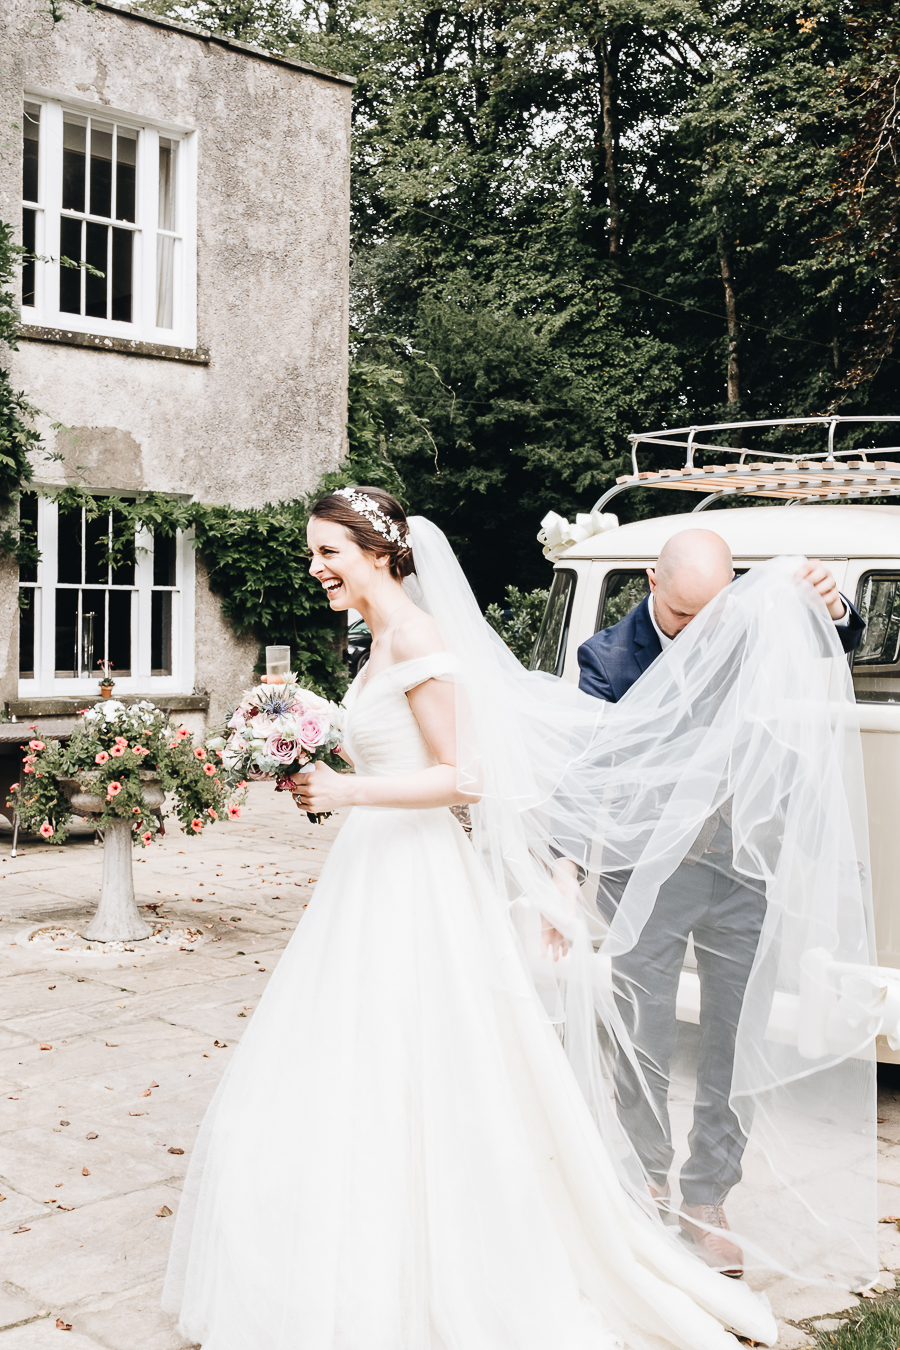 OurBeautifulAdventure-FairyhillWedding-John&Zoe-WeddingBlog-0506.jpg